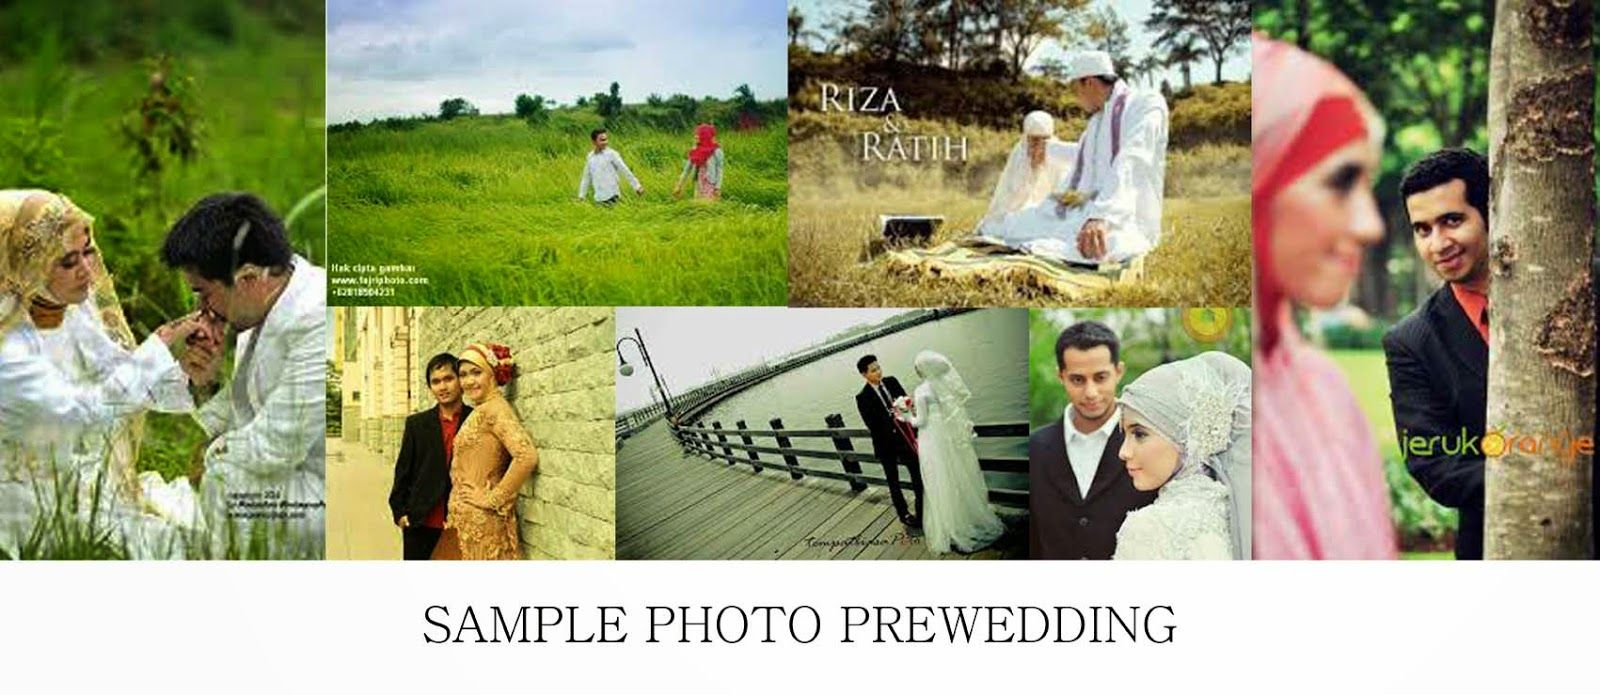 Foto Prewedding Wanita Berjilbabkumpulan Gambar Pre Wedding